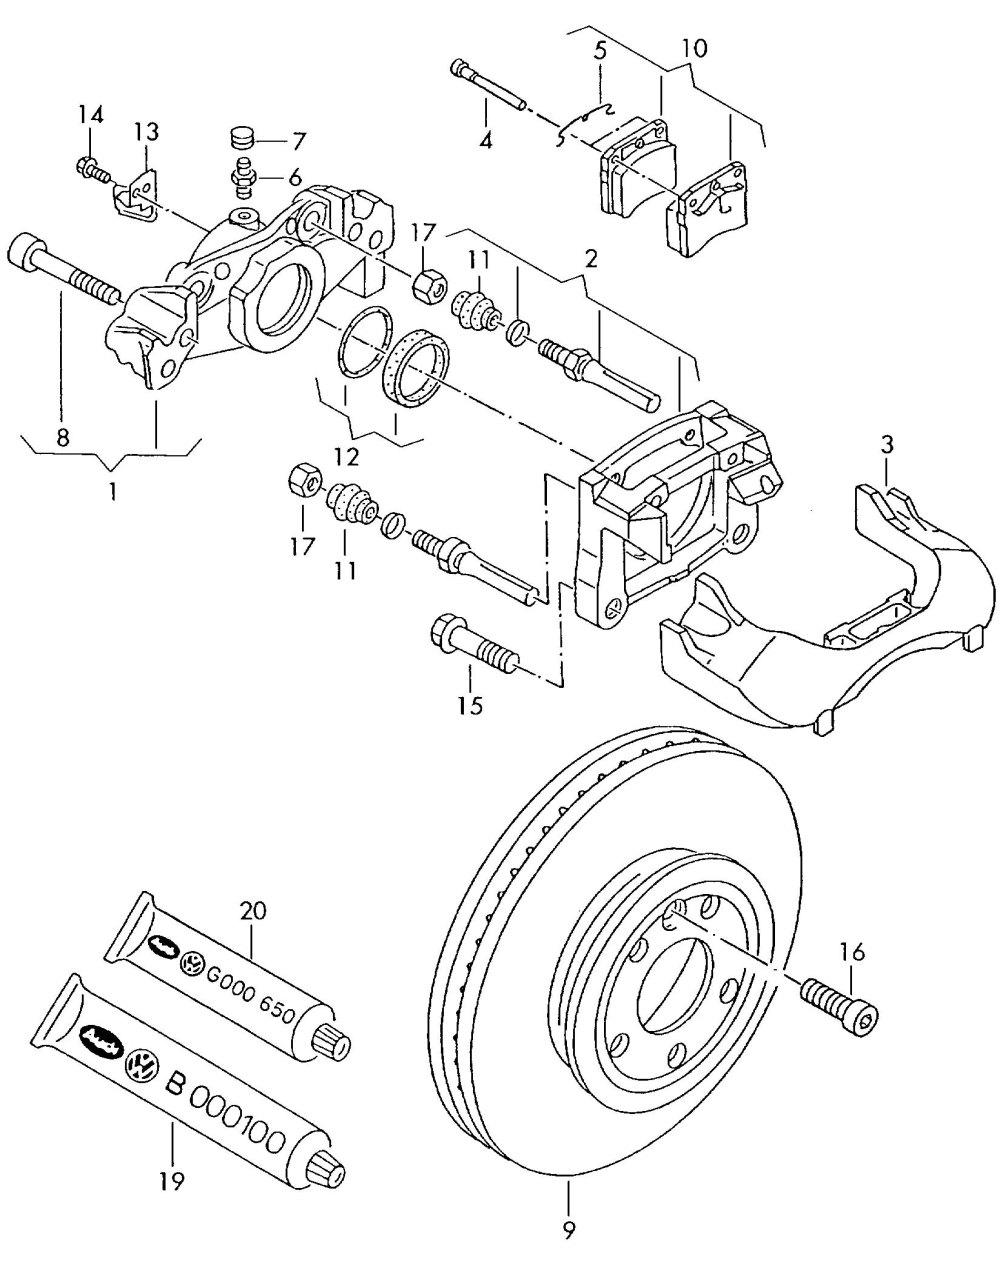 medium resolution of 2012 volkswagen tiguan engine diagram 2012 volkswagen tiguan review engine coolant light volkswagen tiguan wiring diagrams